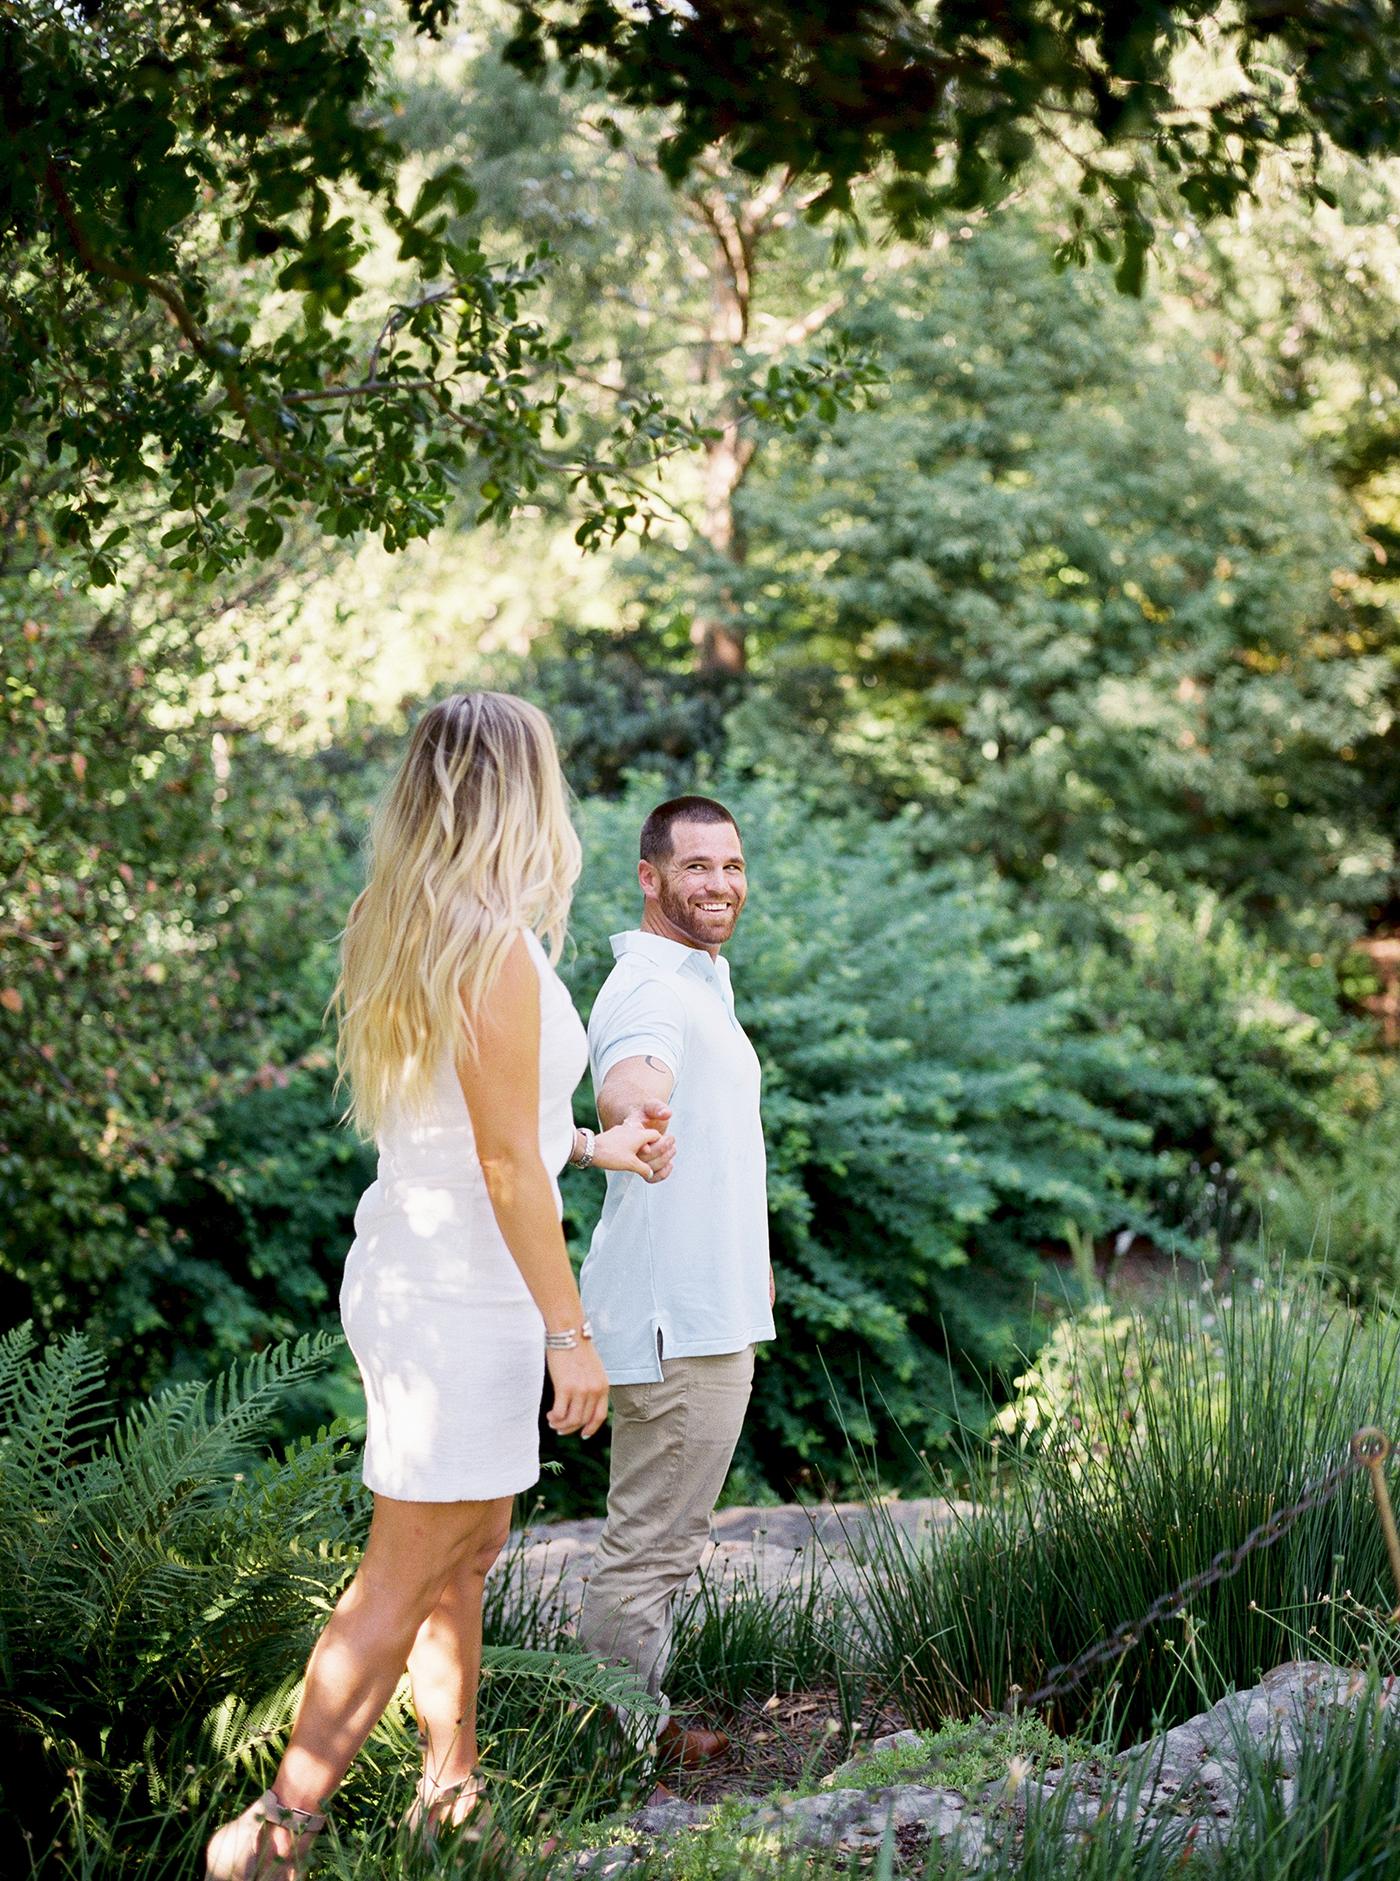 DFW Wedding Plannning | Allday Events | Dallas Arboretum Engagement Session | 00047.jpg